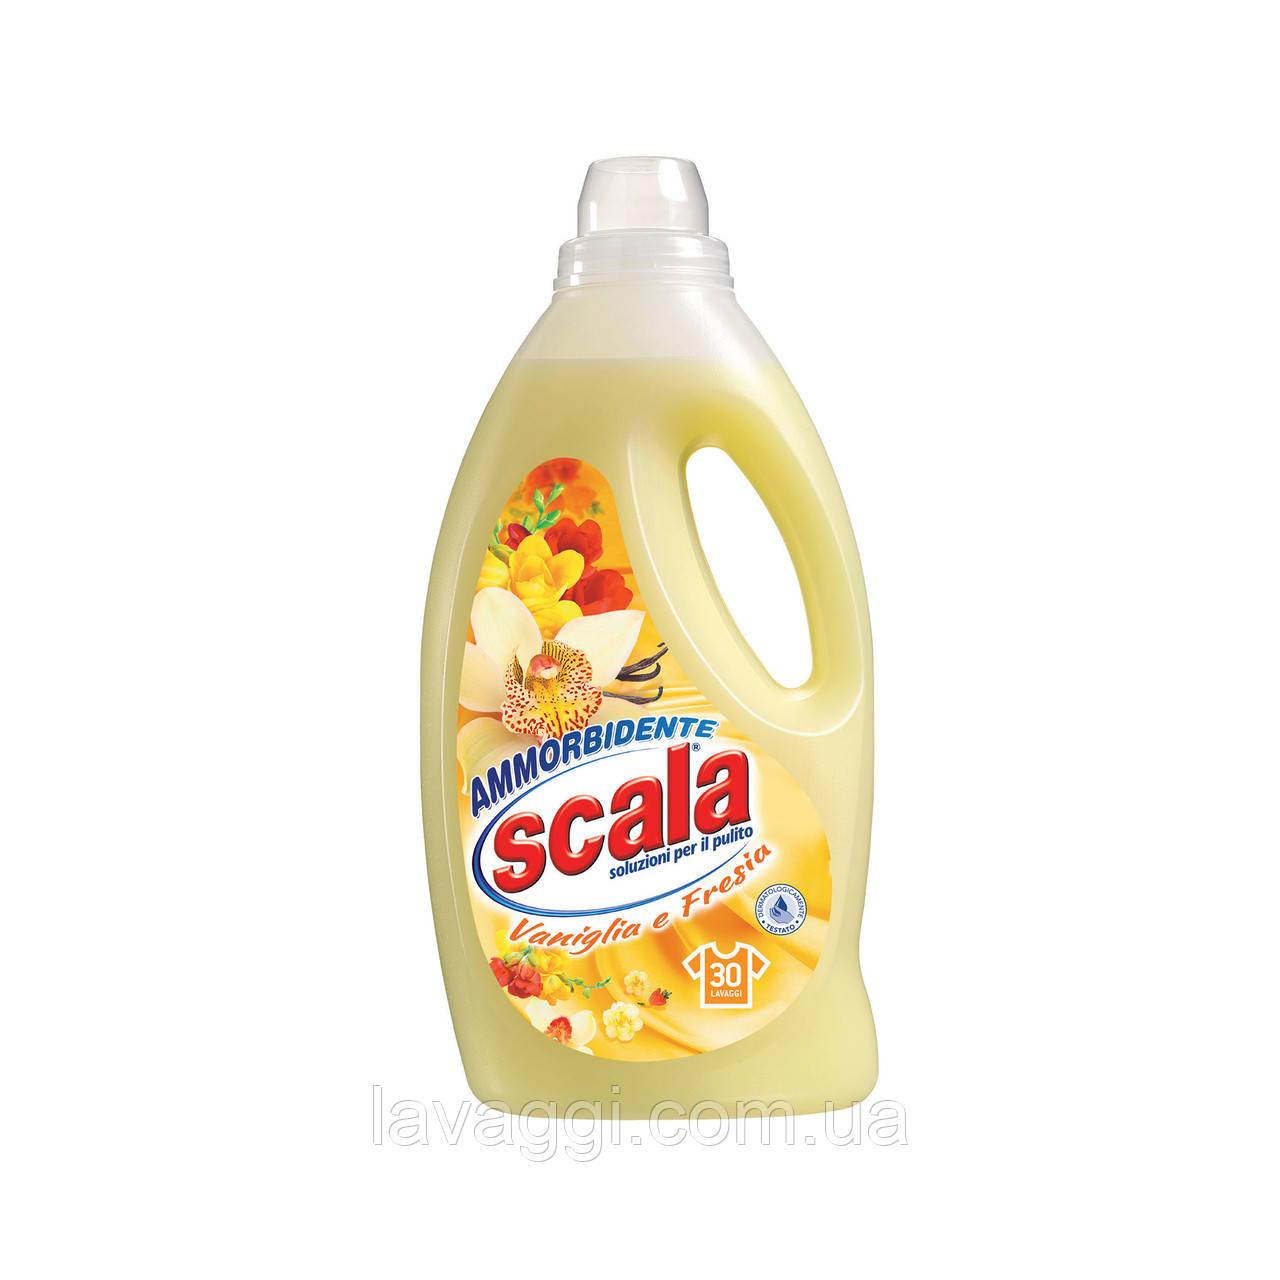 Кондиционер-ополаскиватель для стирки Scala Ammorbidente Vaniglia e Fresia 1650 ml